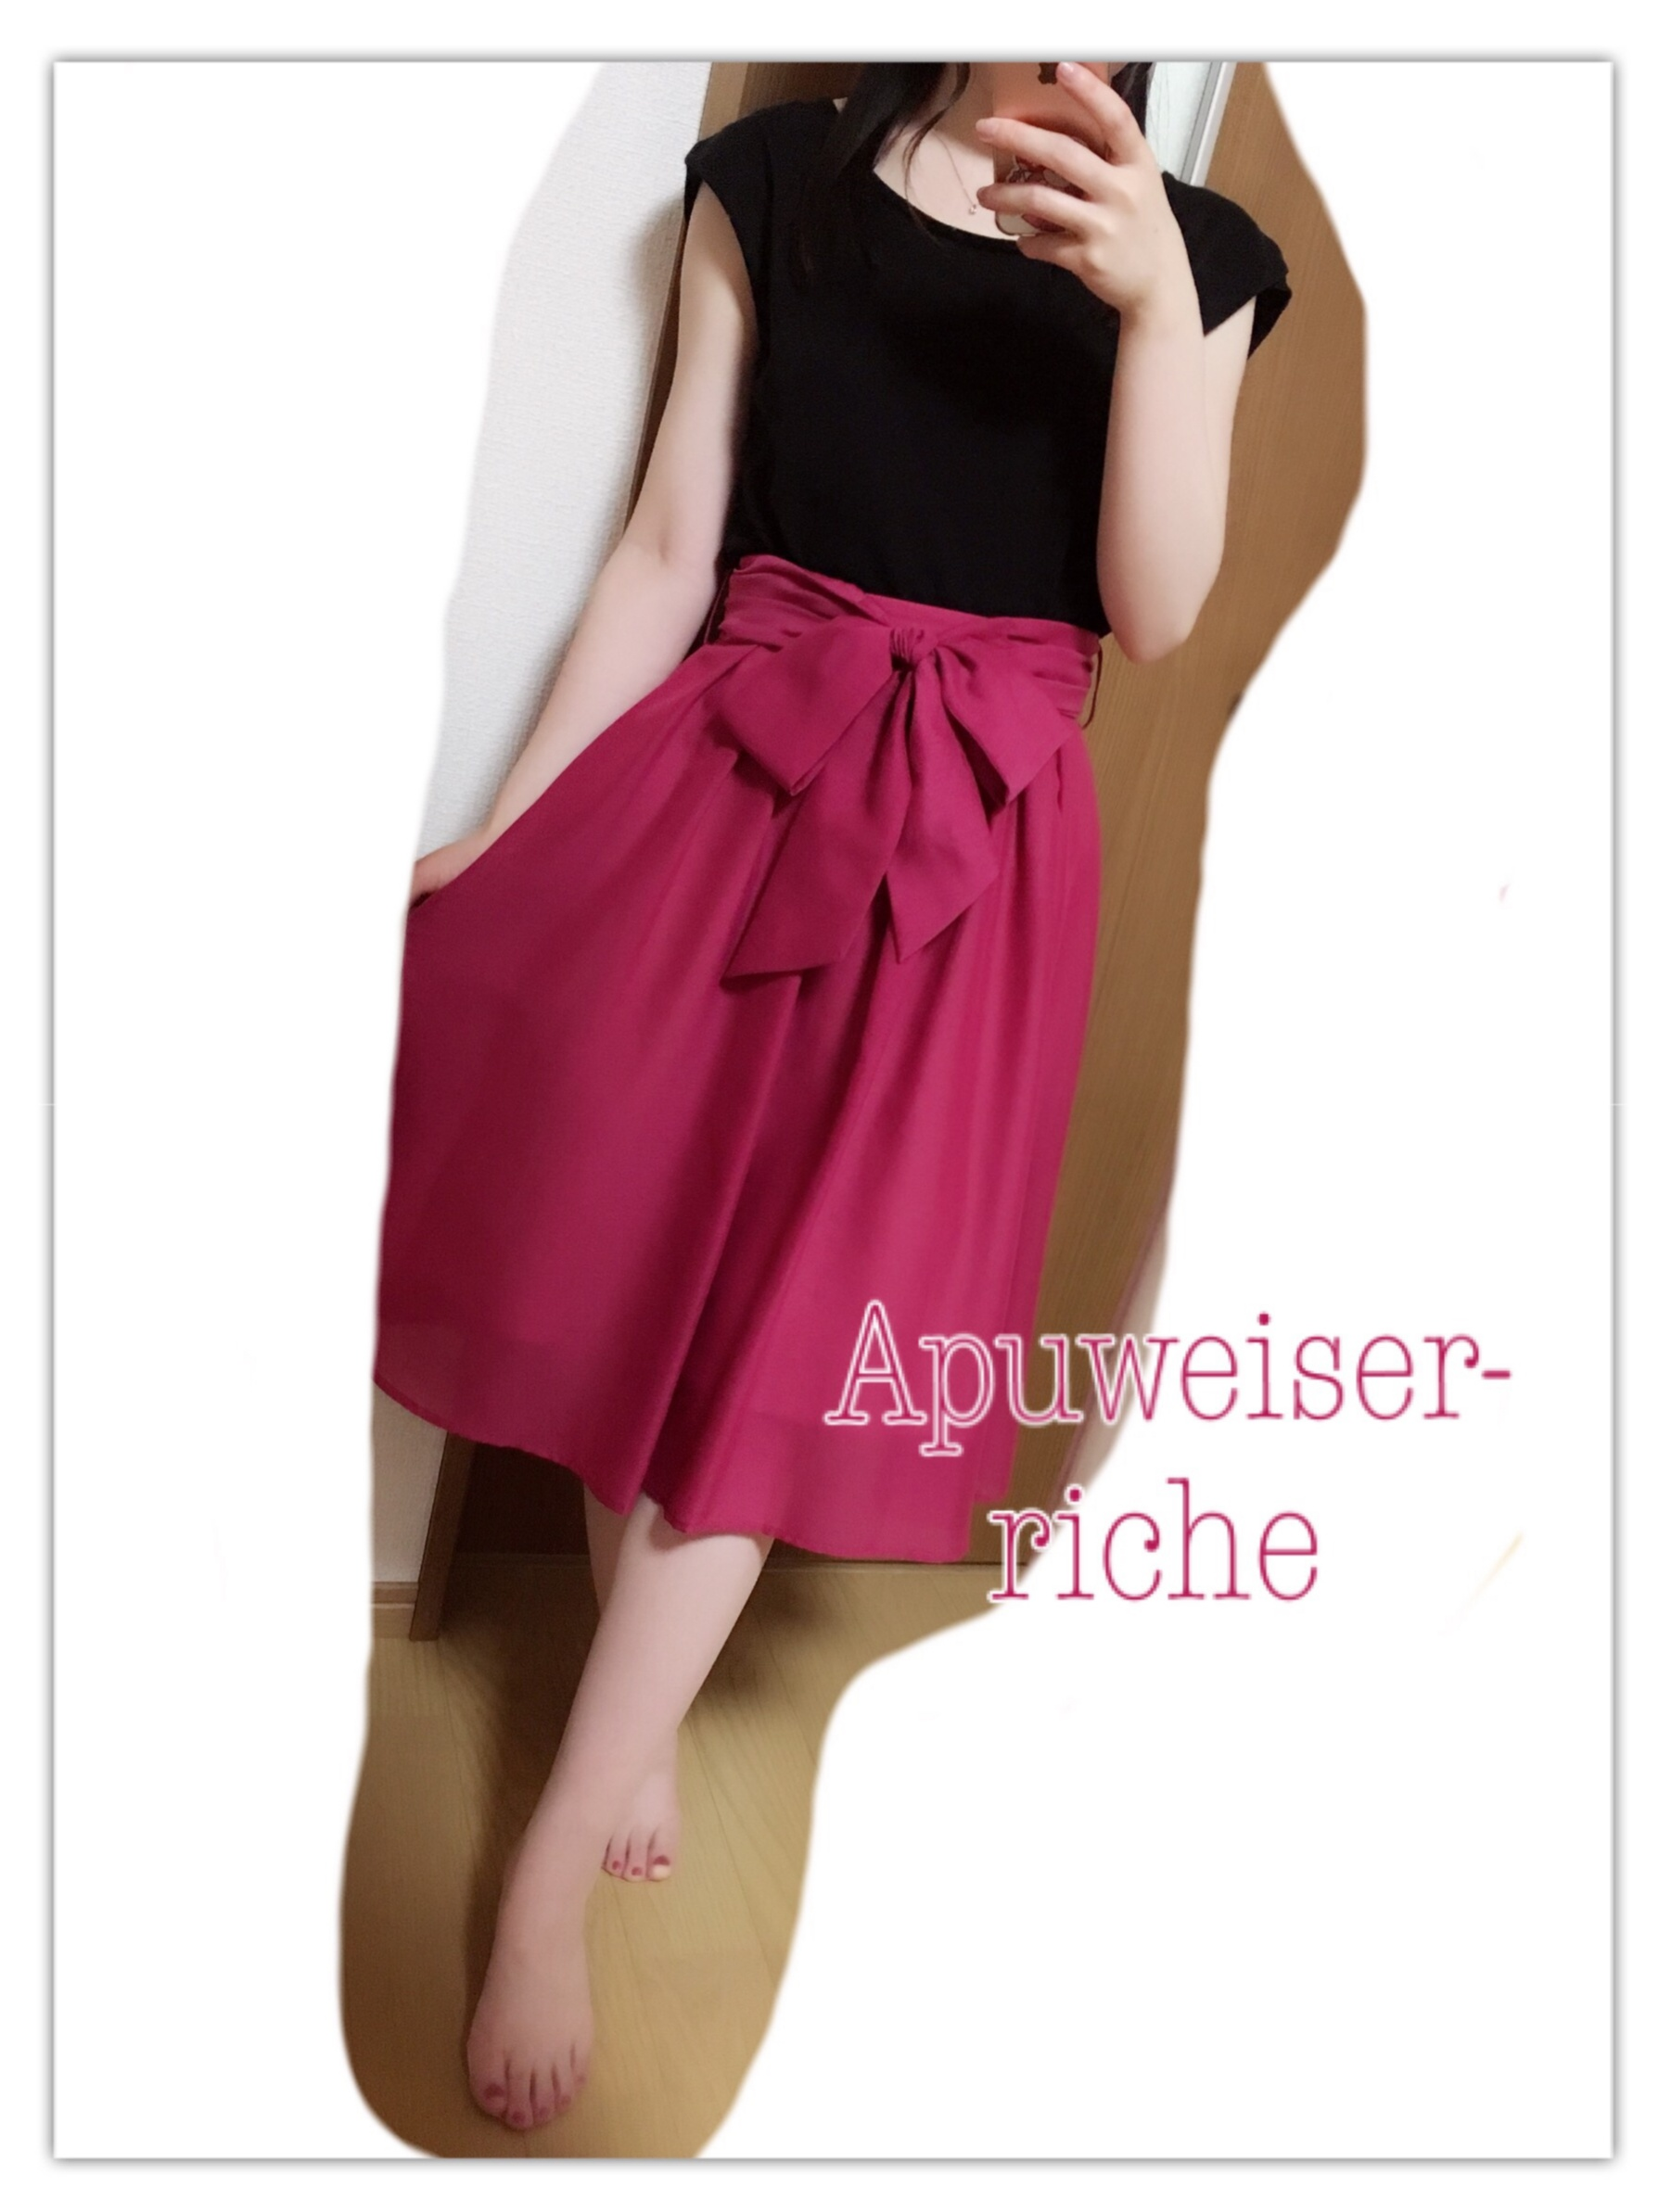 【Apuweiser-riche】の元気色スカートで憂鬱な梅雨を乗り切れっ!♡_1